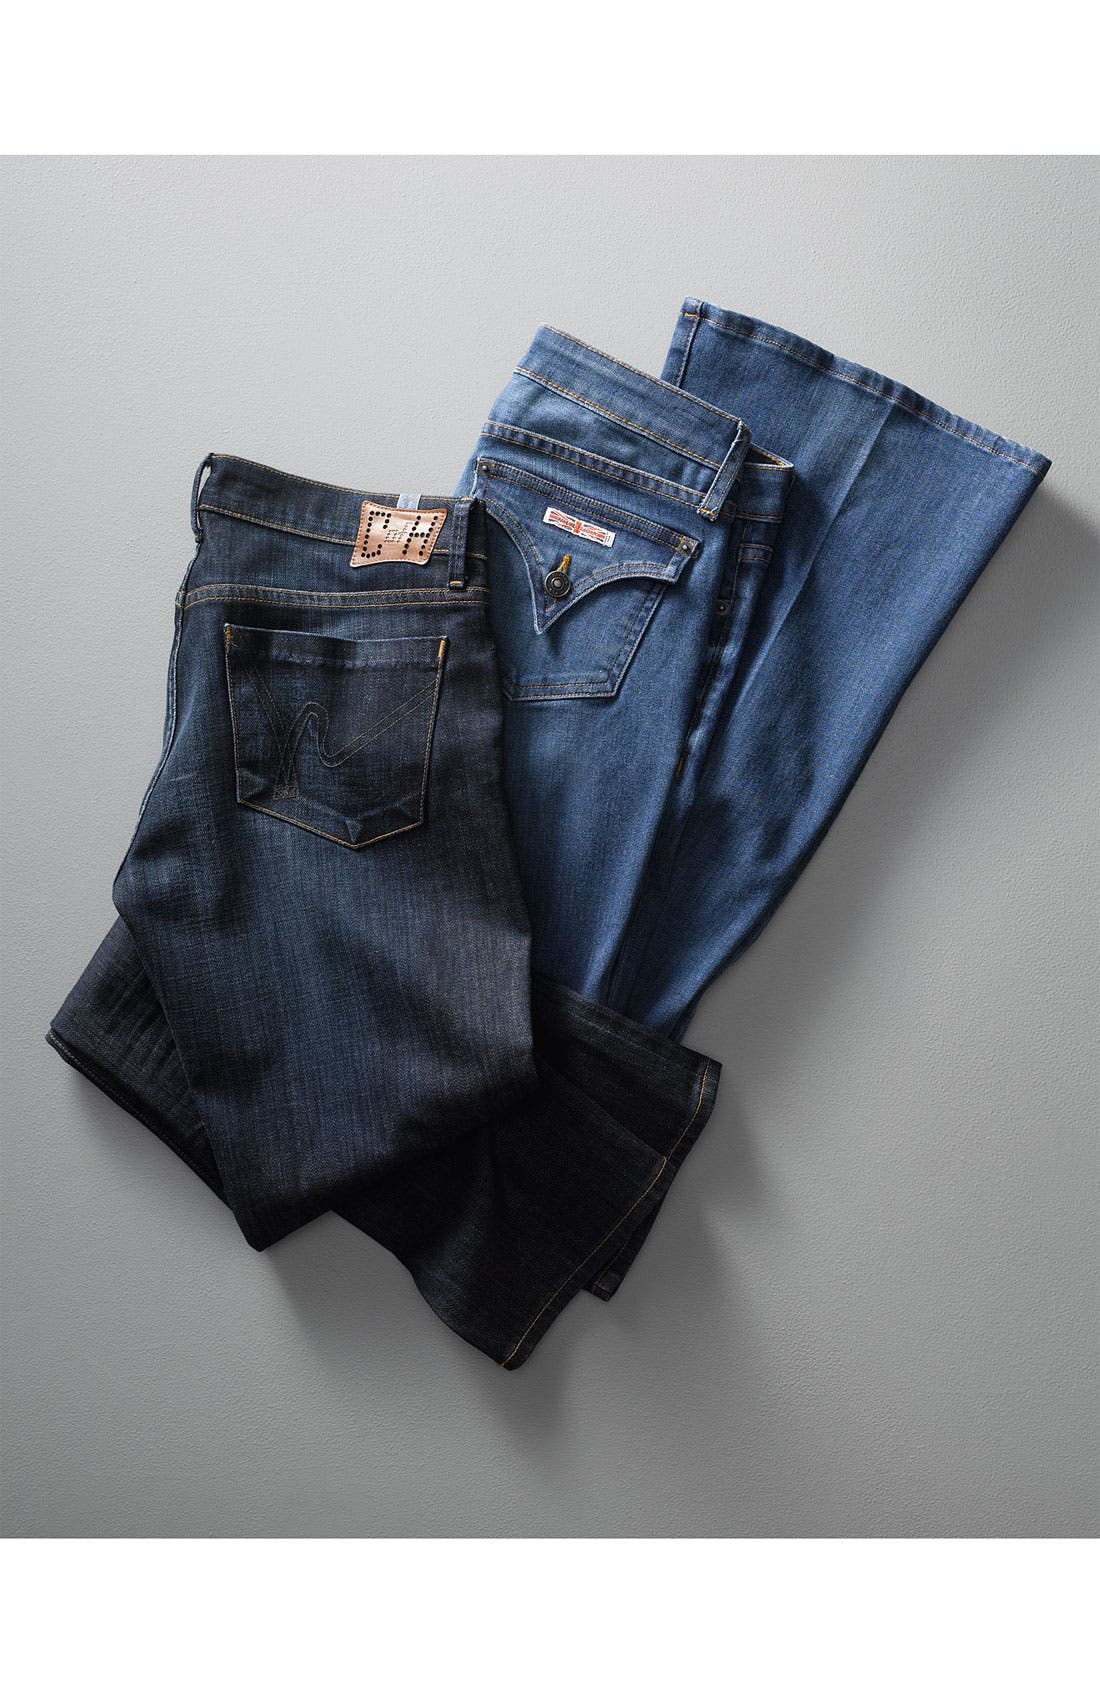 HUDSON JEANS,                             'Ferris' Flare Leg Stretch Denim Jeans,                             Alternate thumbnail 5, color,                             401